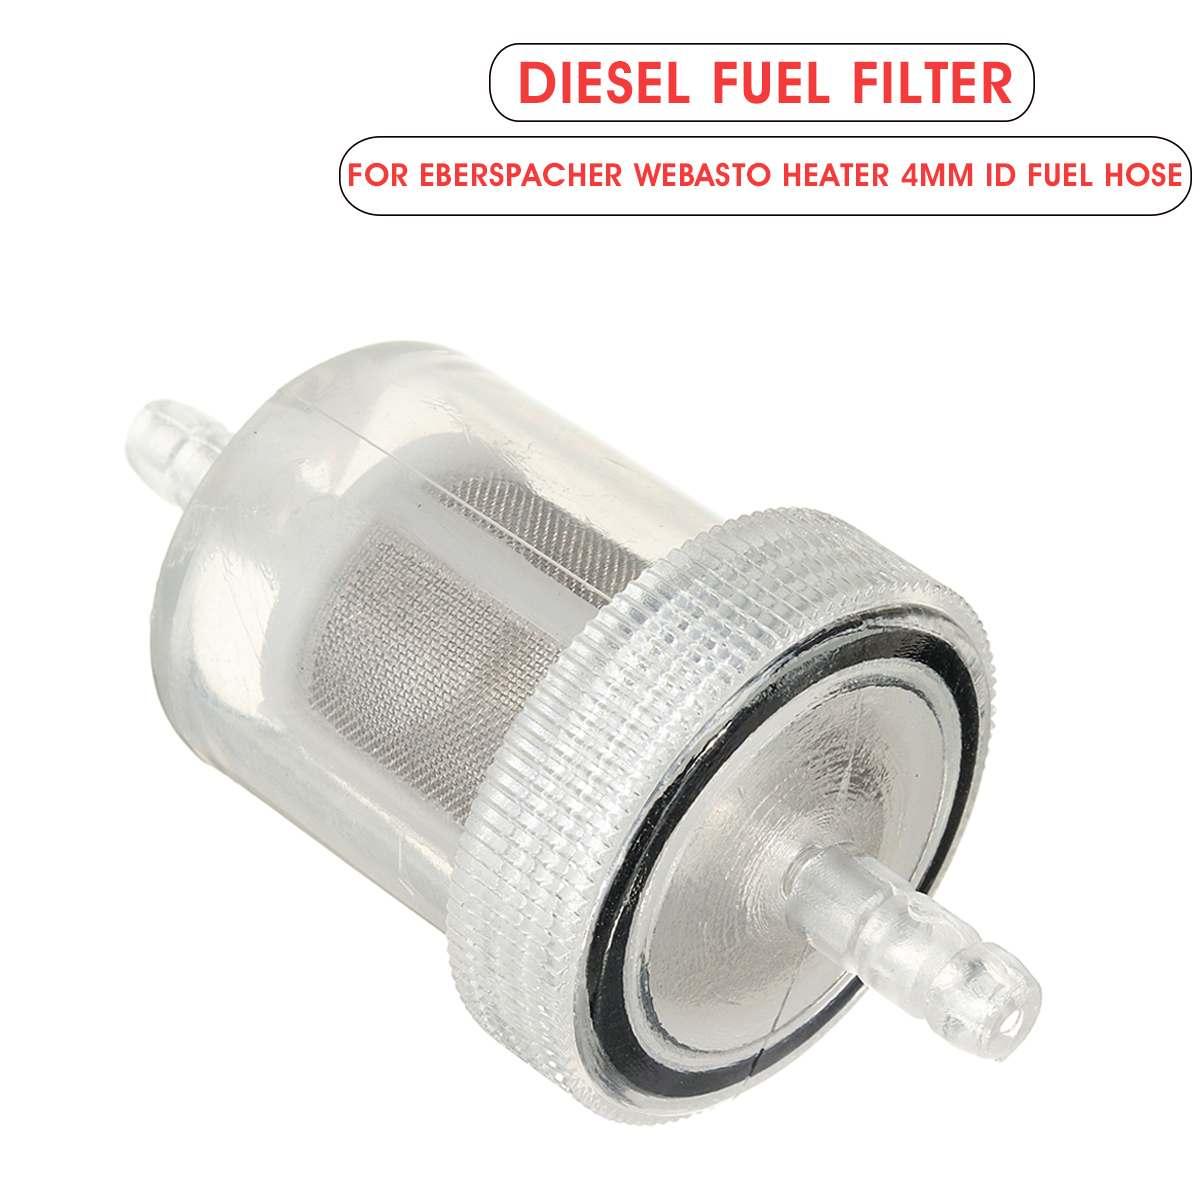 4mm Car Air Diesel Parking Heater Fuel Filter Gas Oil Filter Universal For RV Caravan Motorhome